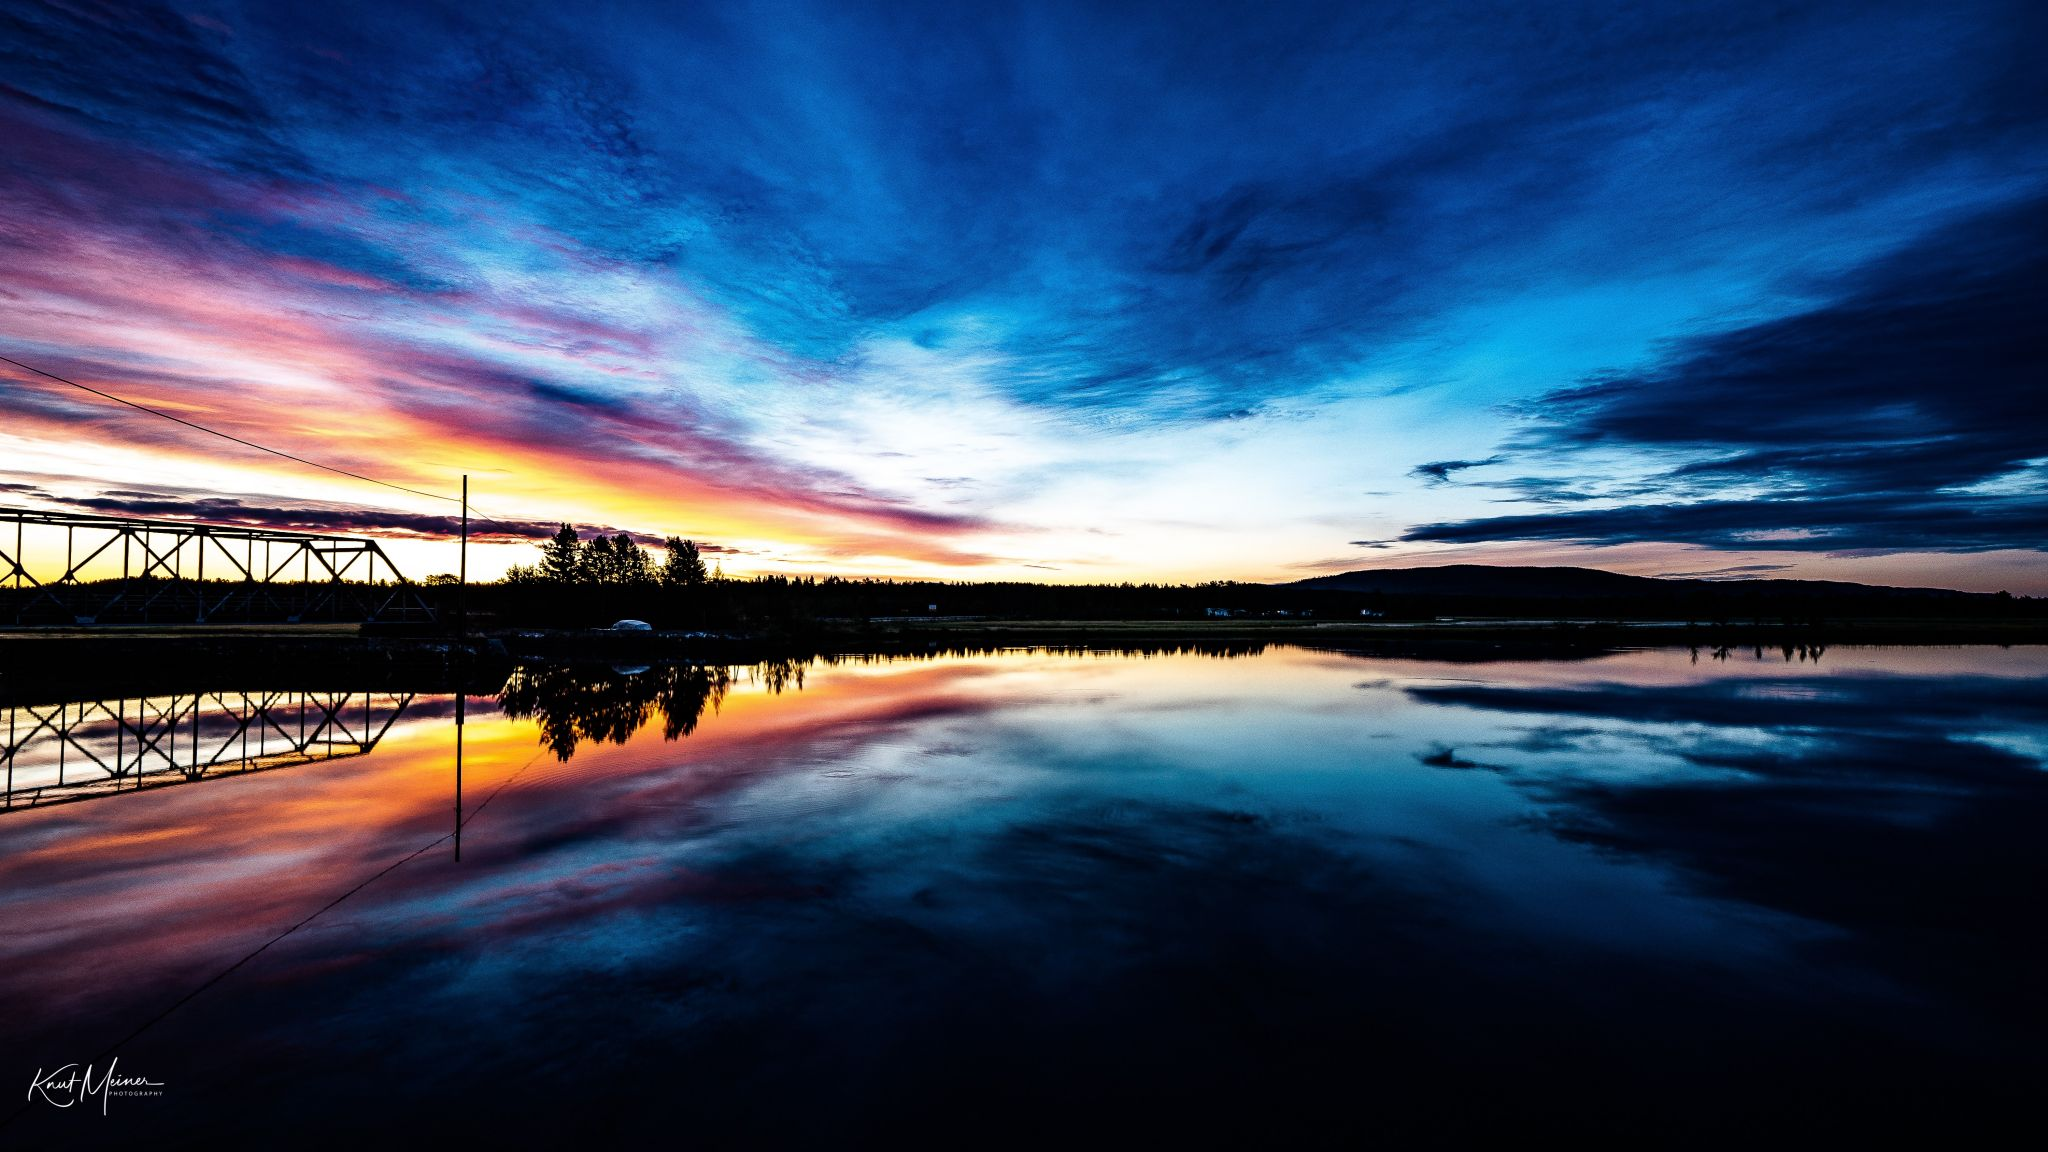 Nordre Osen, Norway